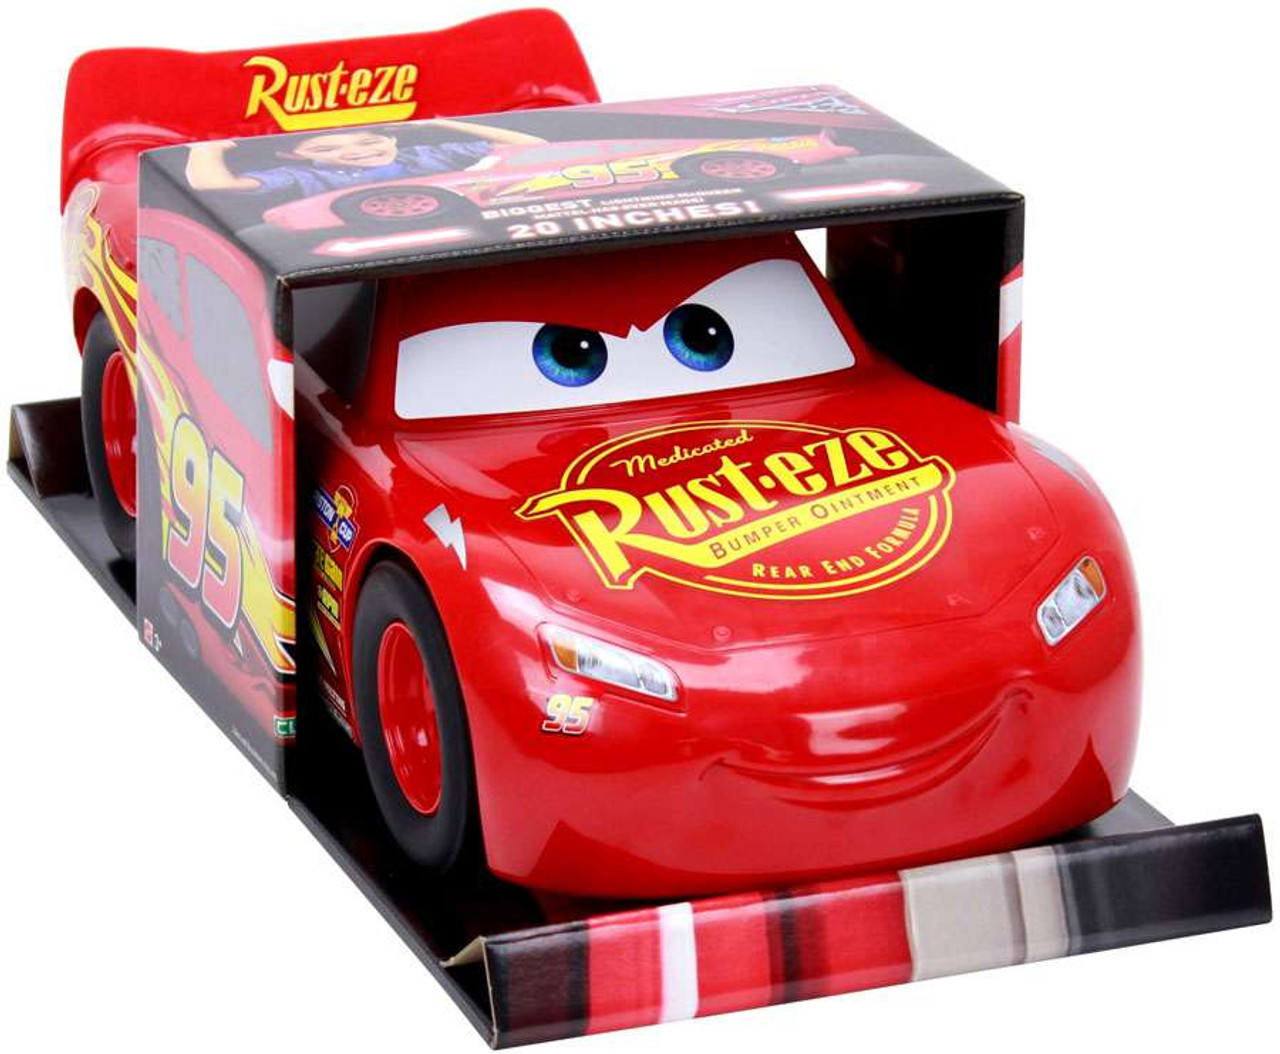 b9f3a1925dd Disney Pixar Cars Cars 3 Lightning McQueen 20 Vehicle Mattel Toys - ToyWiz